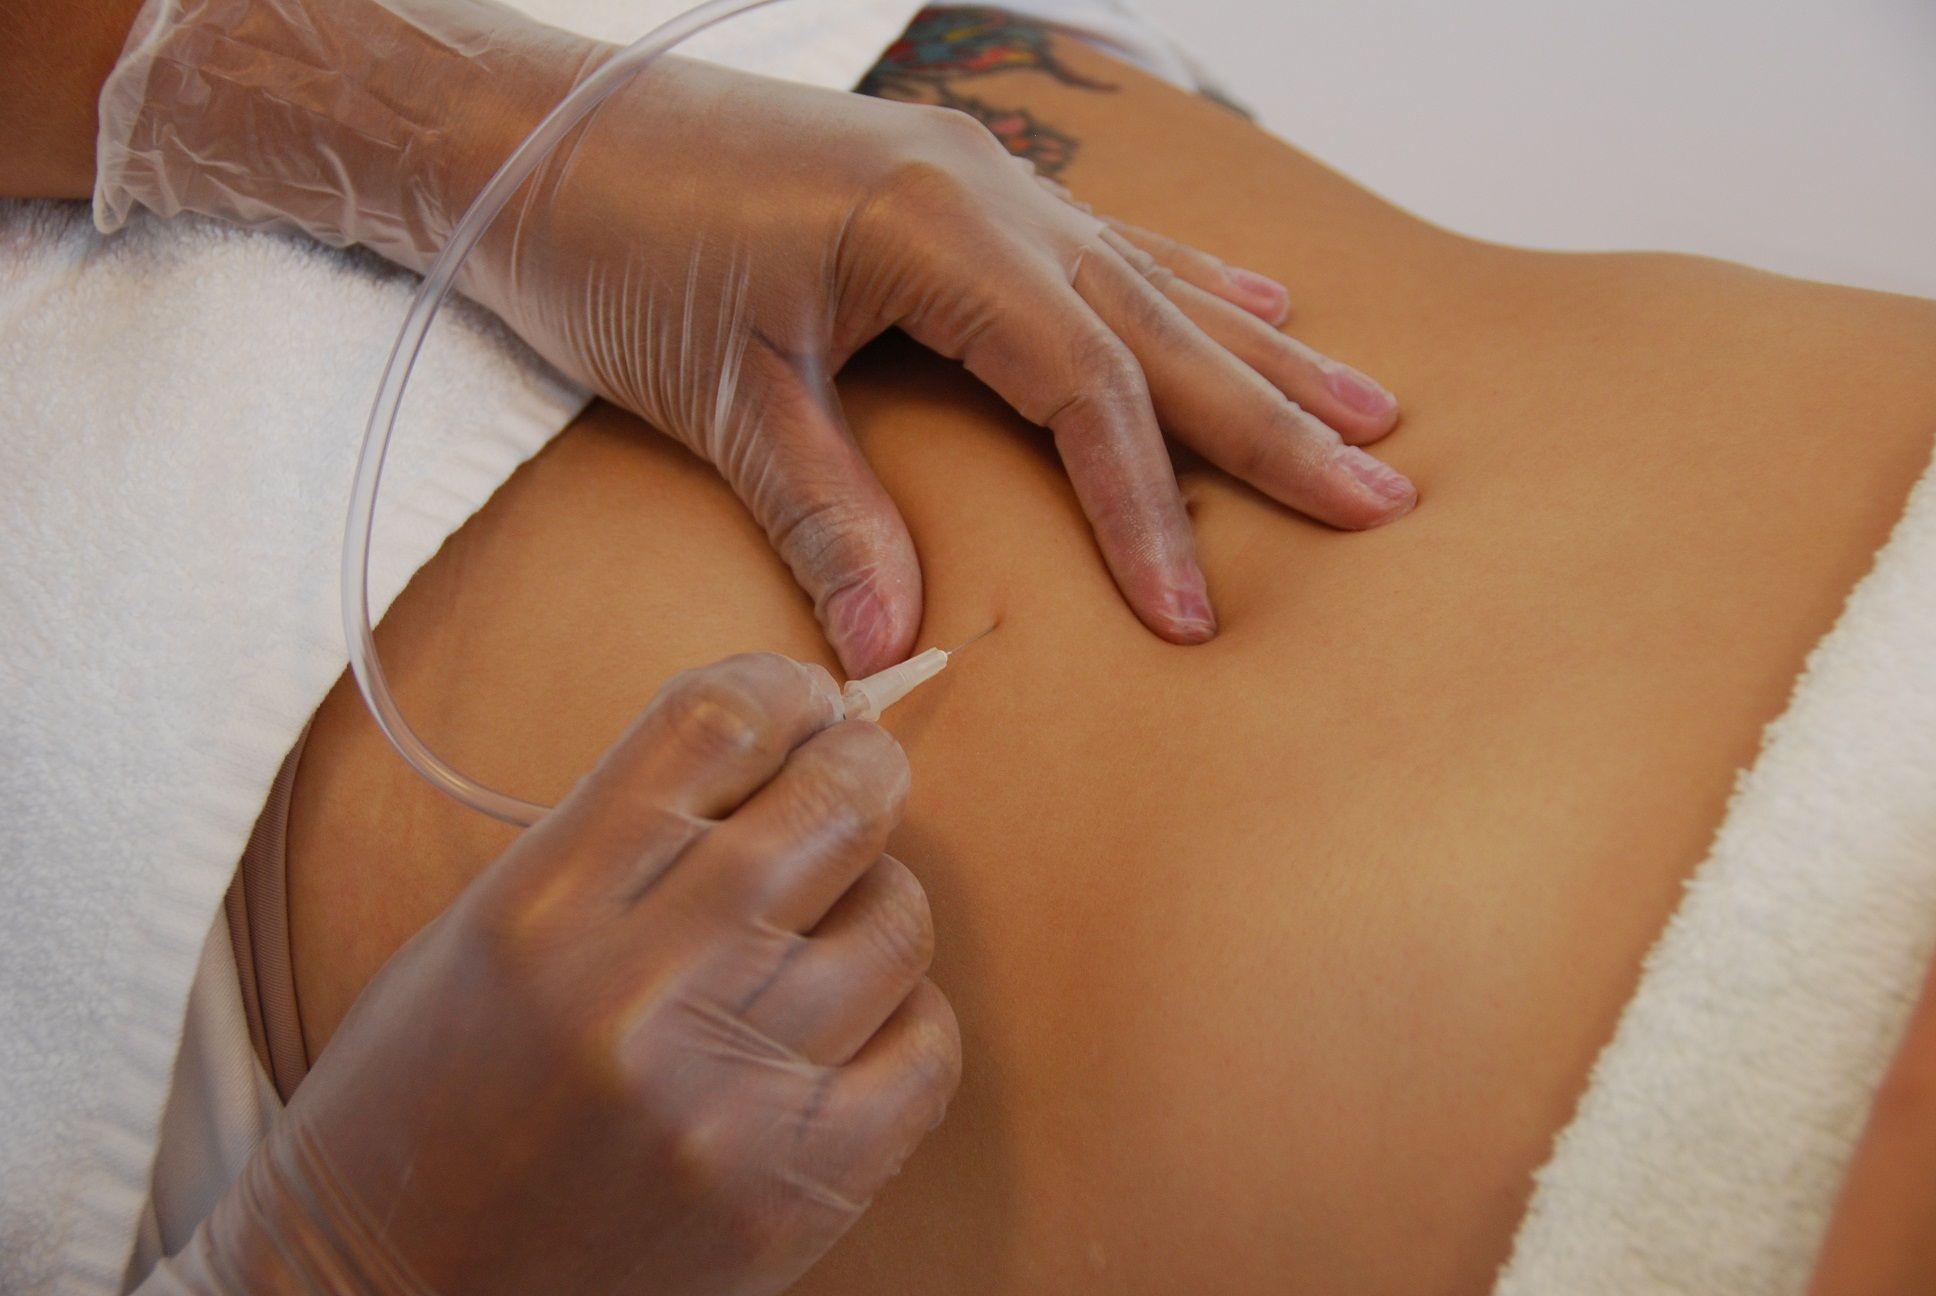 Carboxiterapia Celulite Procedimentos Esteticos E Vacuoterapia